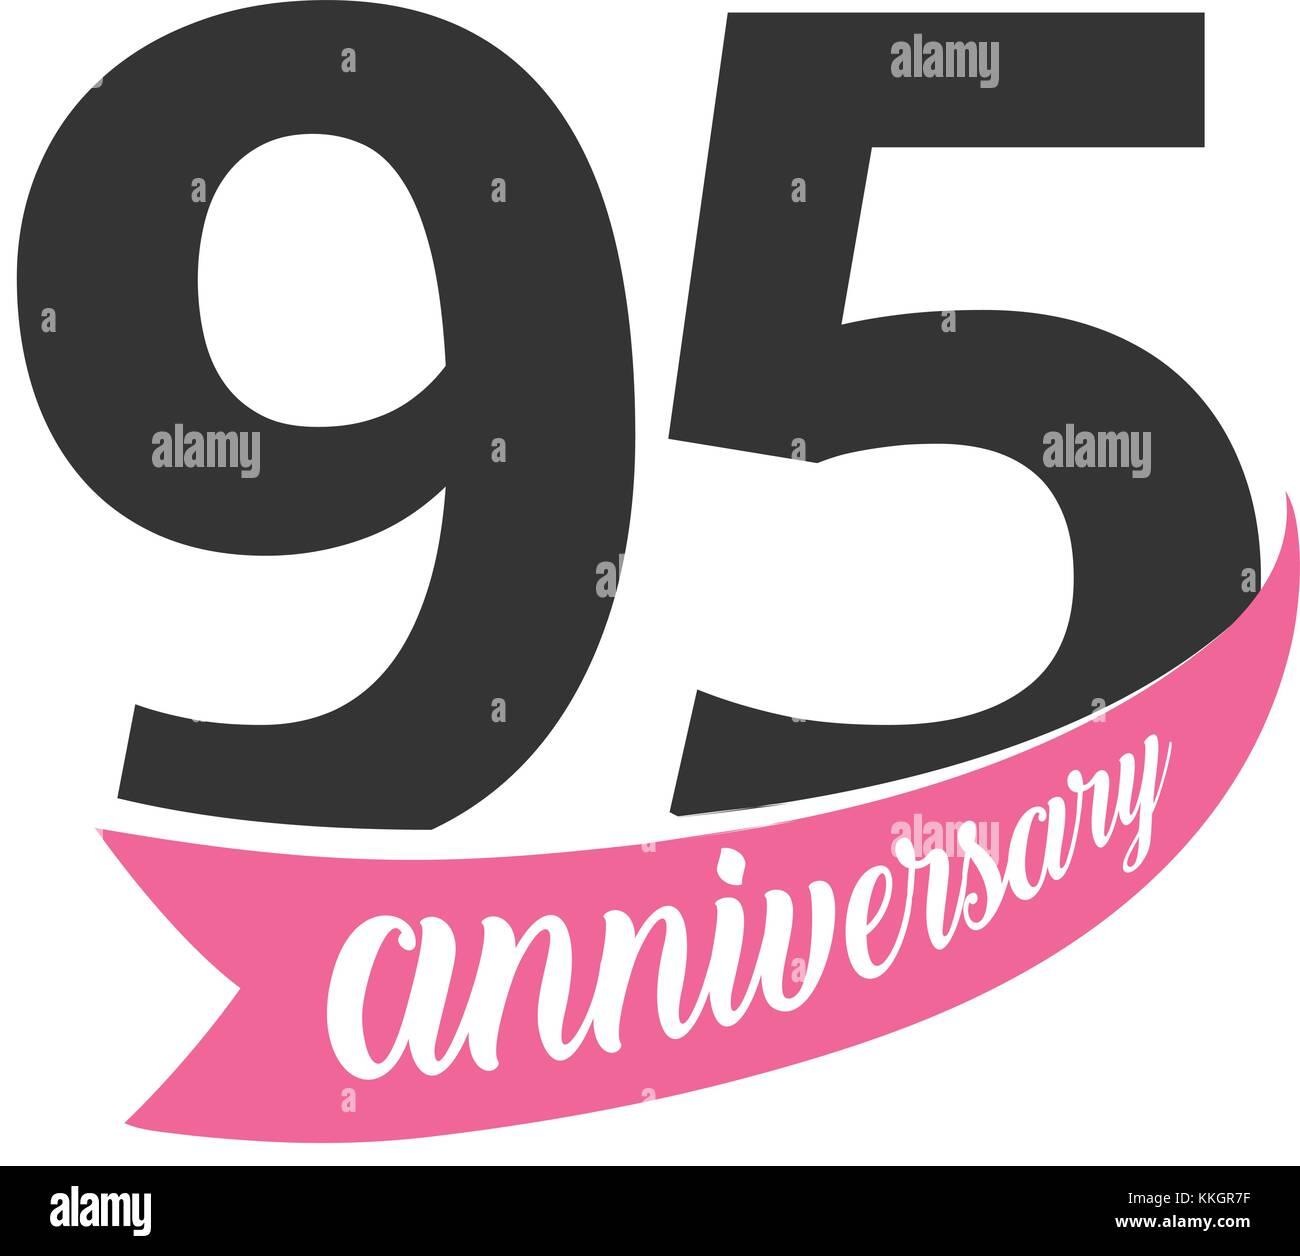 Quinto Anniversario Di Matrimonio.Novanta Quinto Anniversario Logo Vettoriale Numero 95